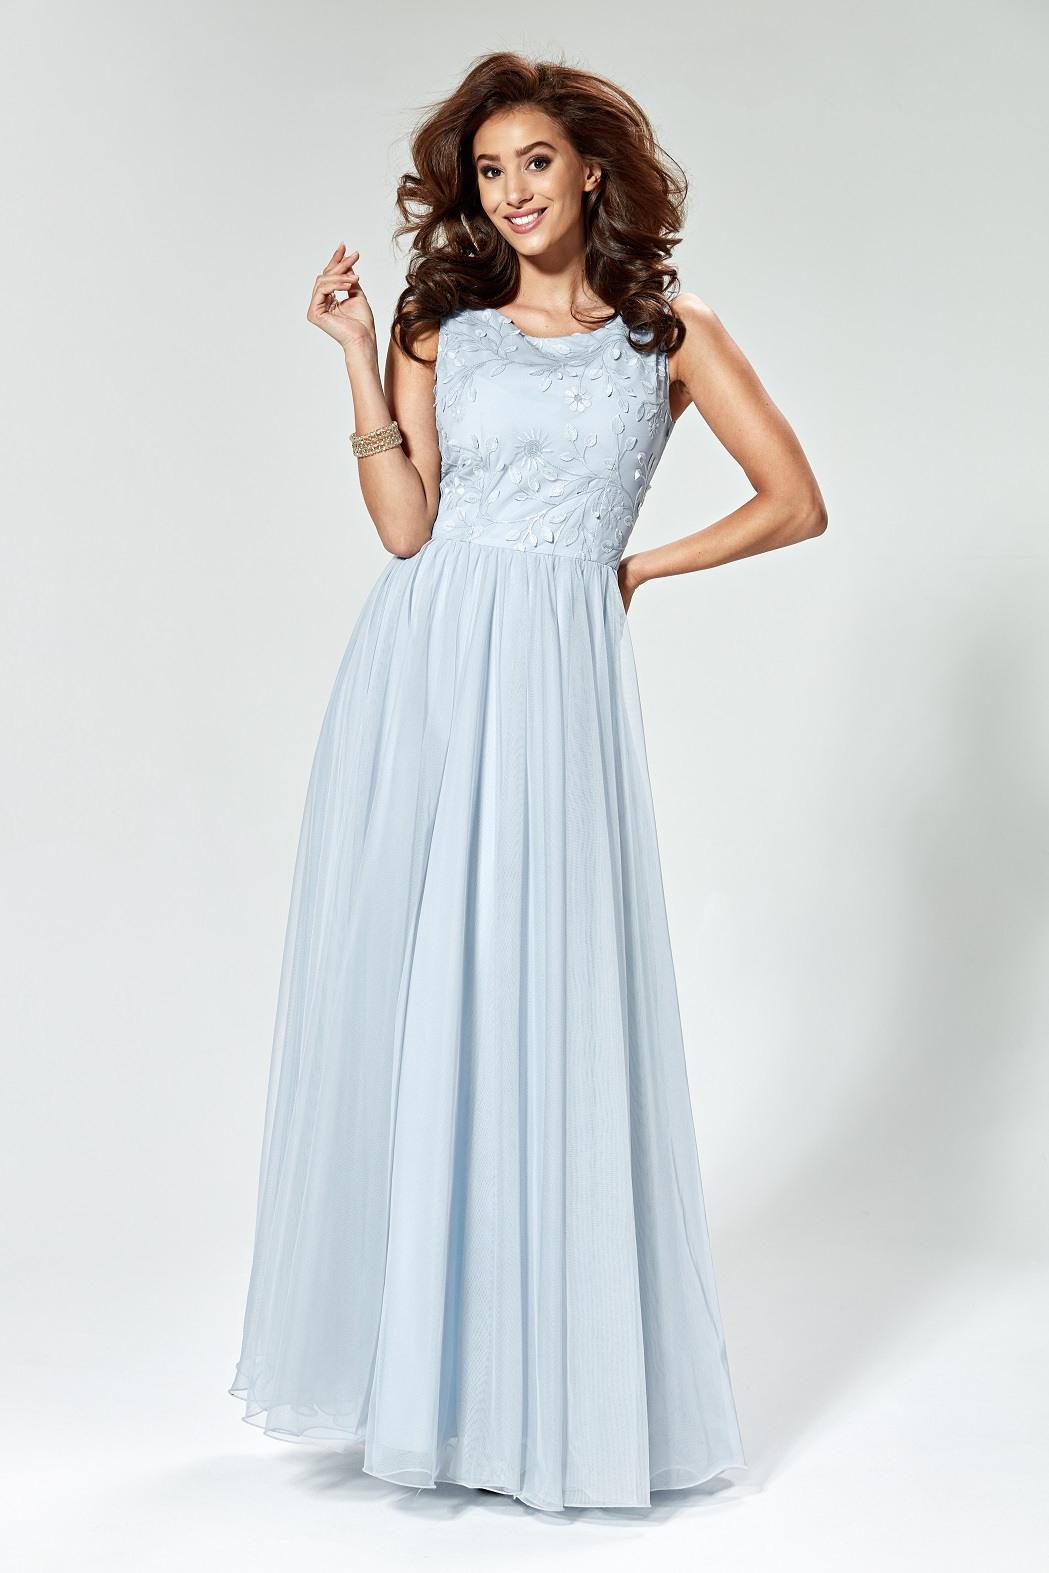 Formal Erstaunlich Hellblaues Abendkleid Lang Vertrieb10 Einzigartig Hellblaues Abendkleid Lang Design